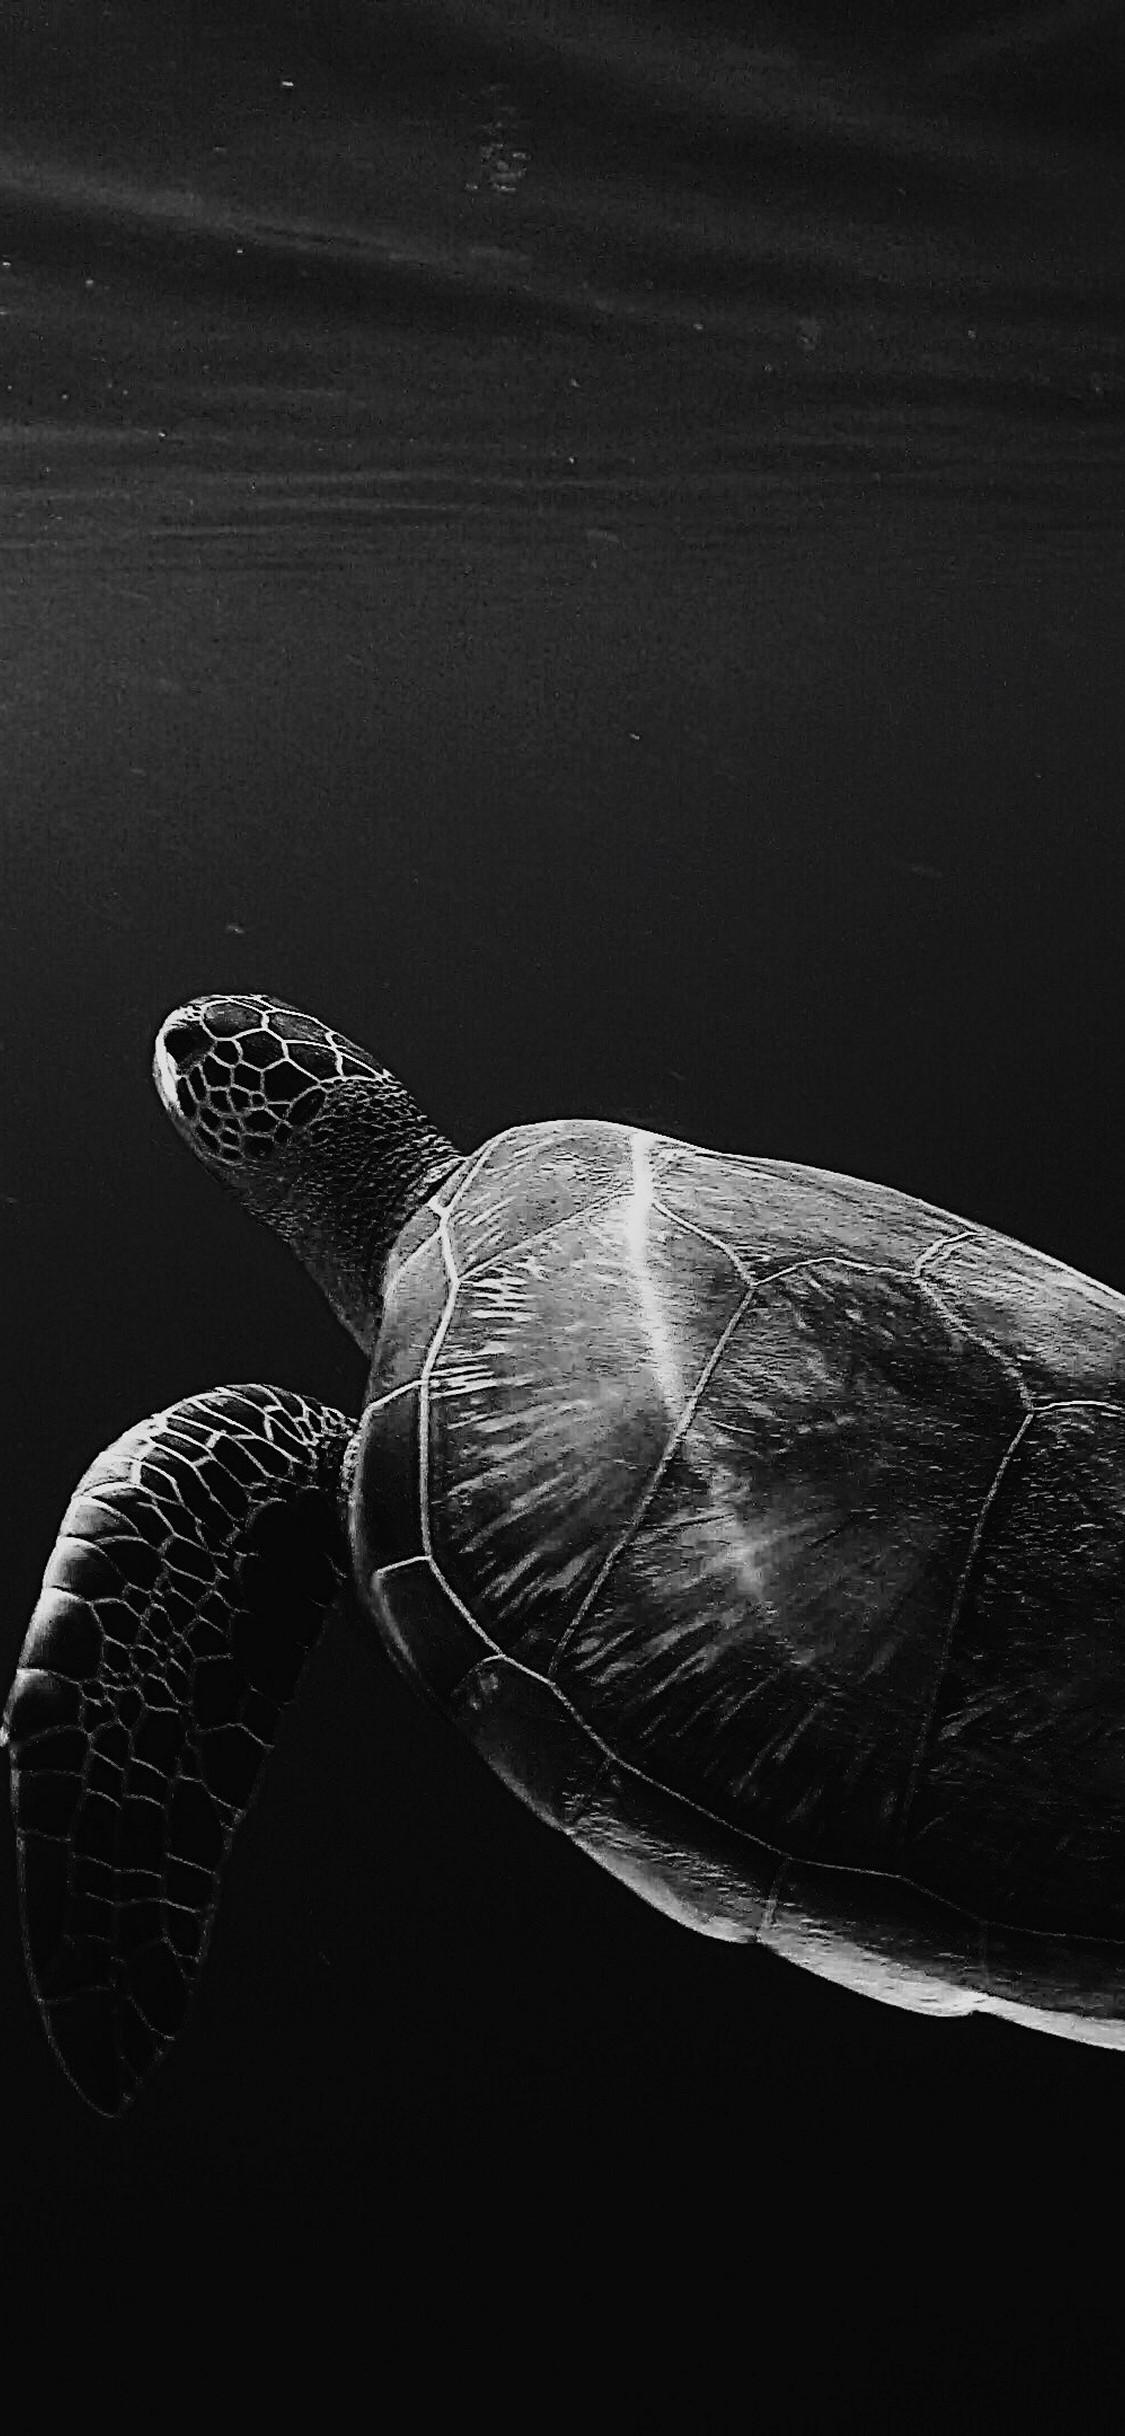 iPhone wallpaper sea turtle Fonds d'écran iPhone du 08/08/2018